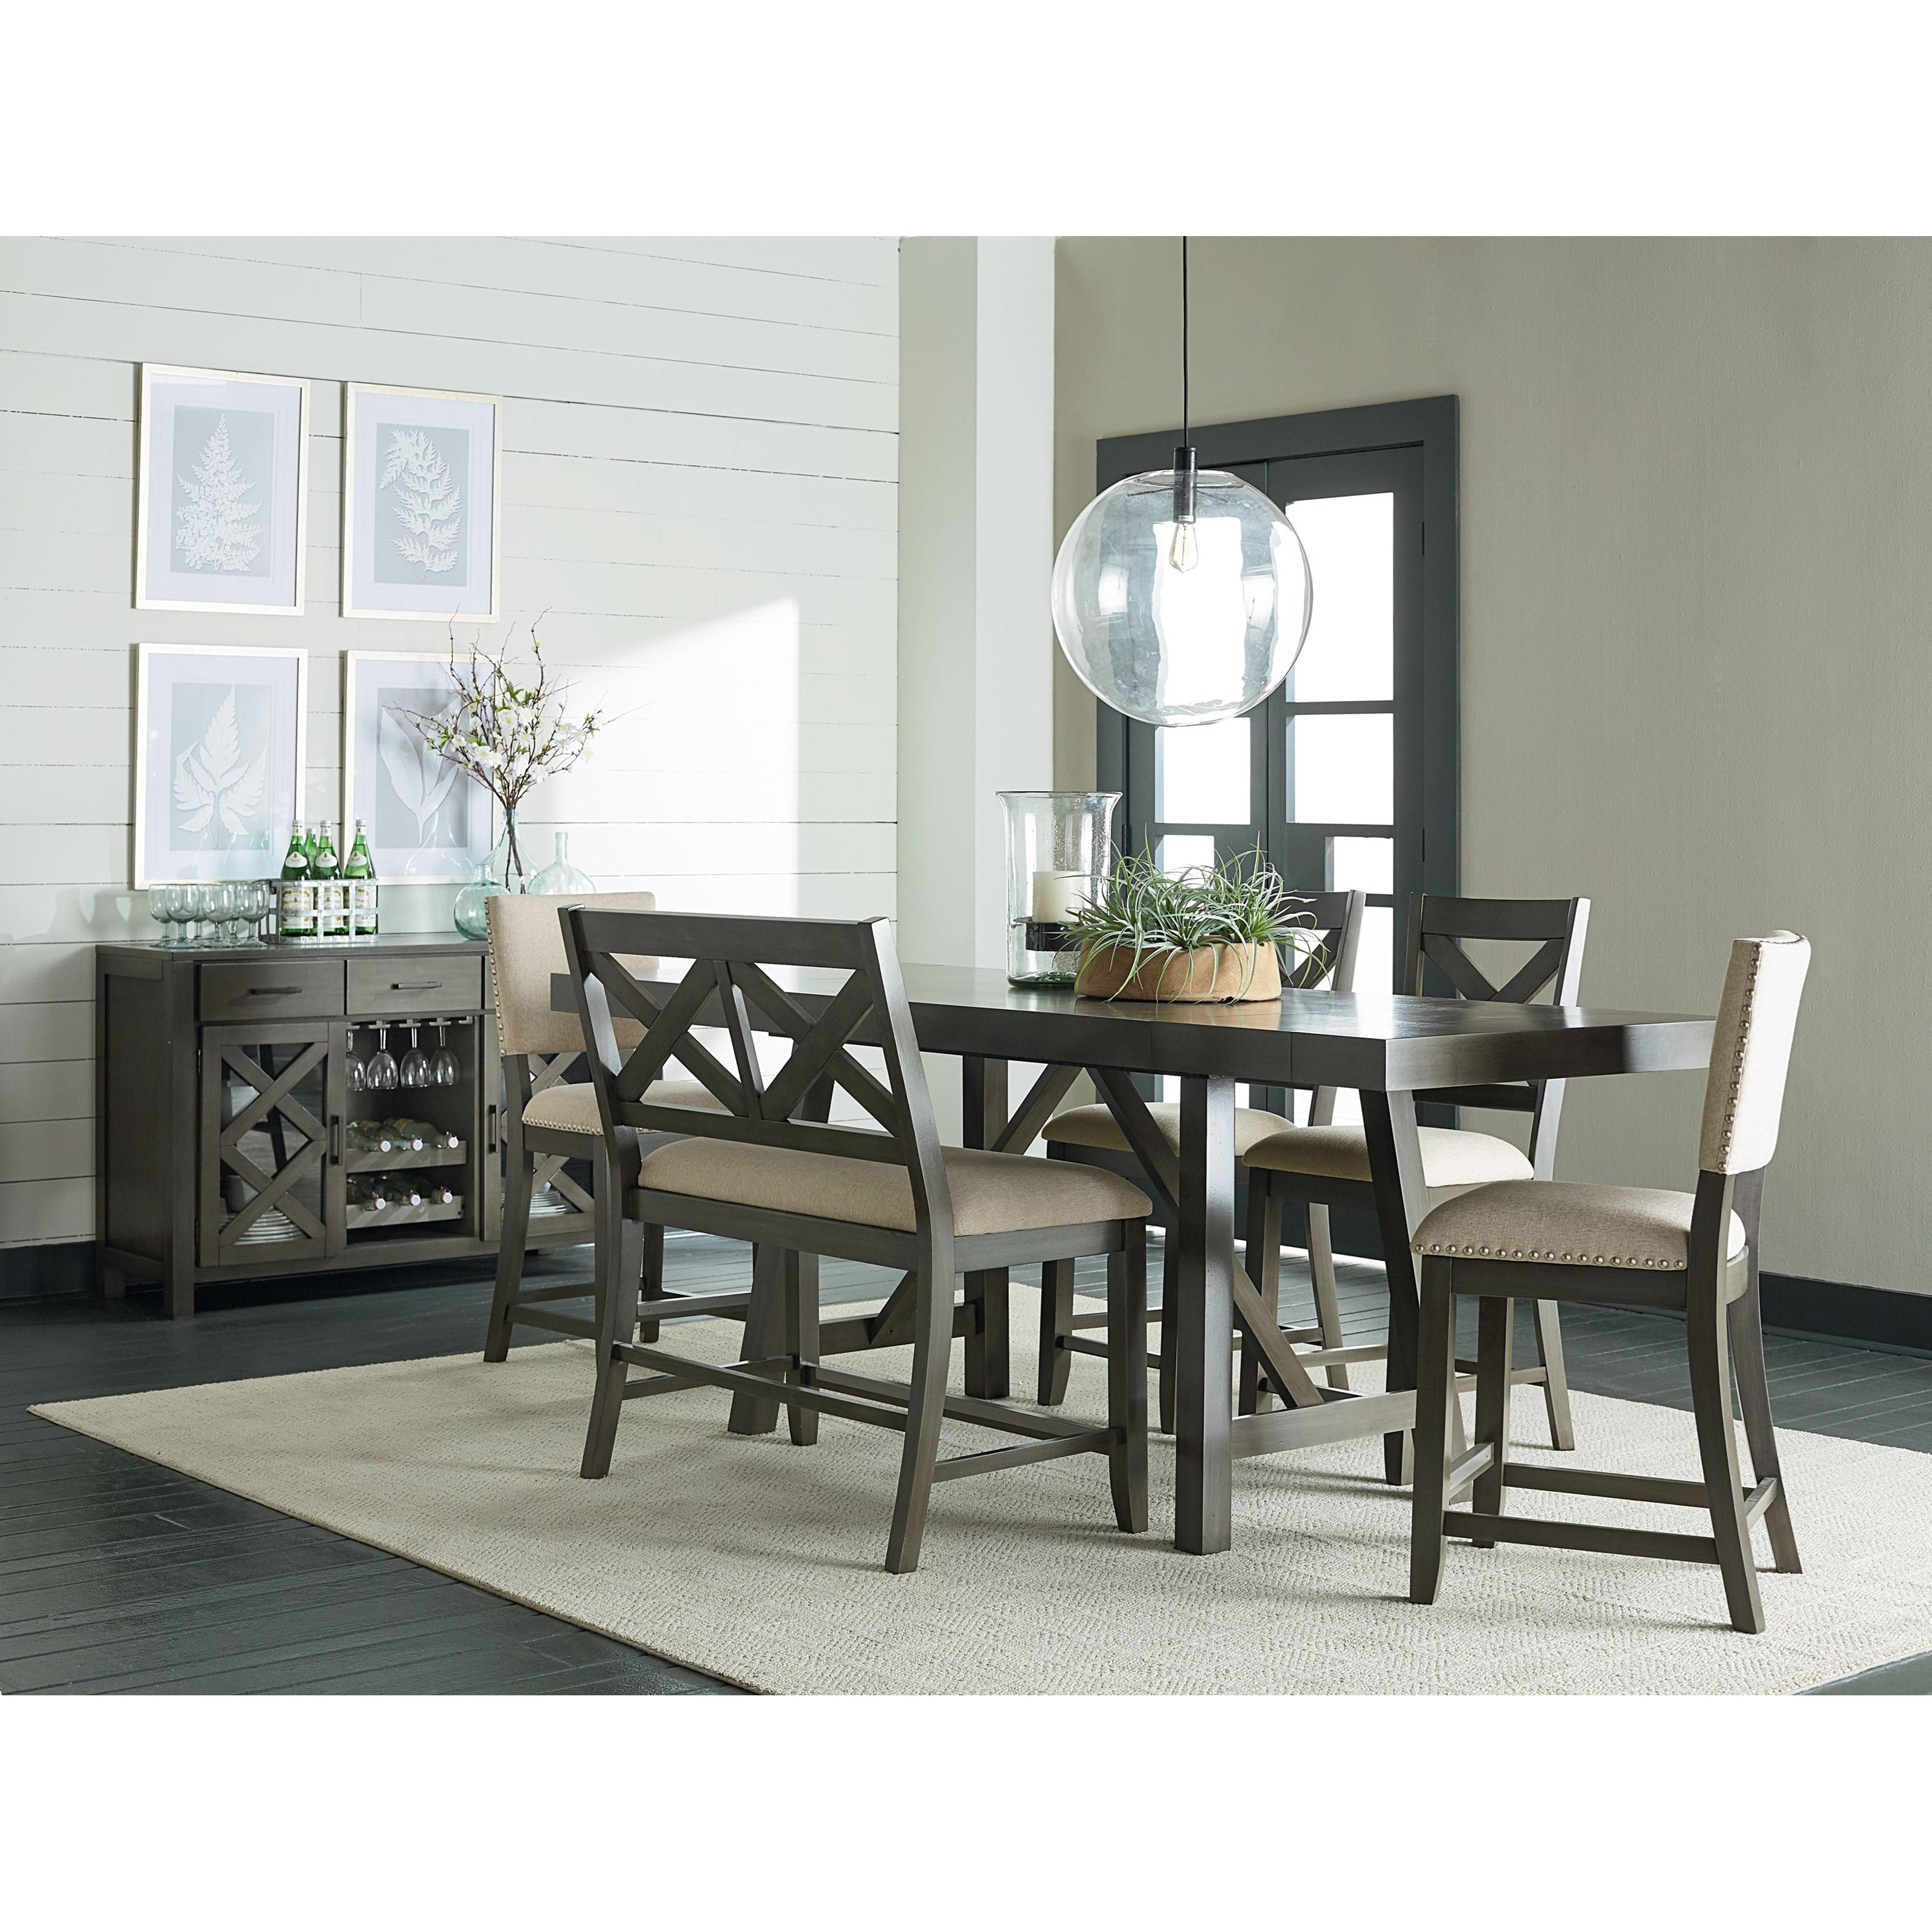 Standard Furniture Omaha GreyCounter Height Dining Set ...